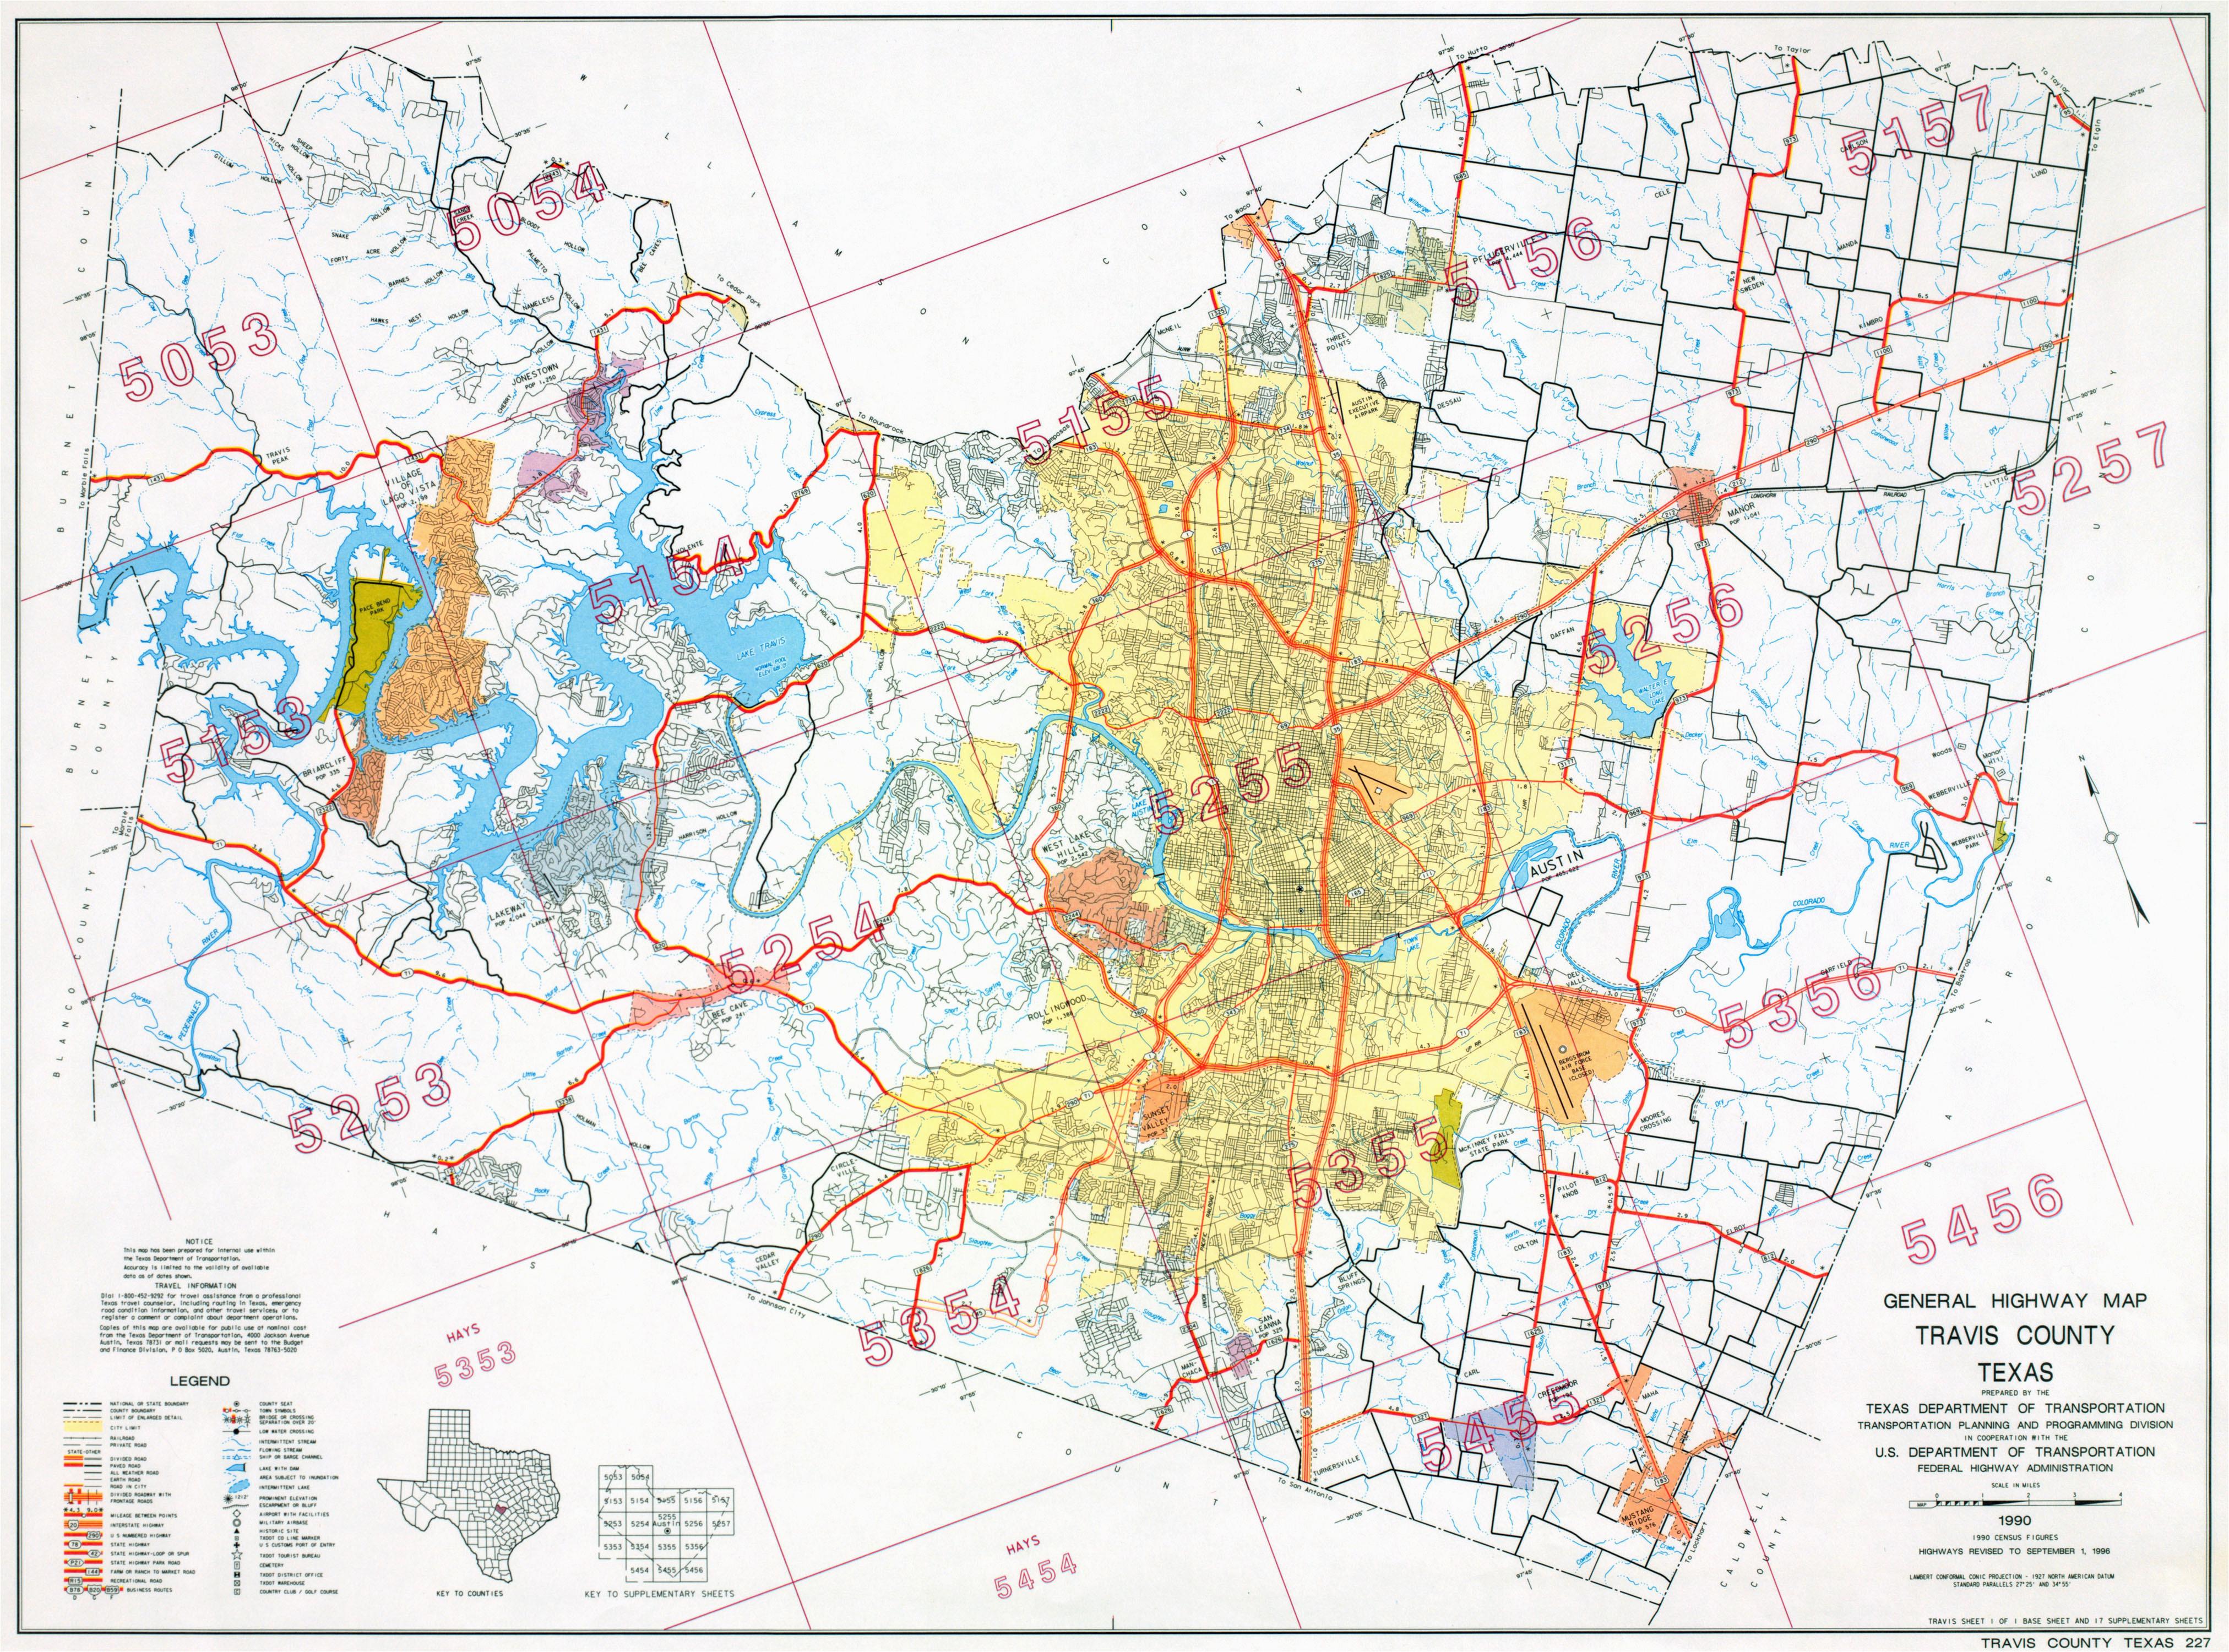 amarillo tx zip code lovely map texas showing austin map city austin